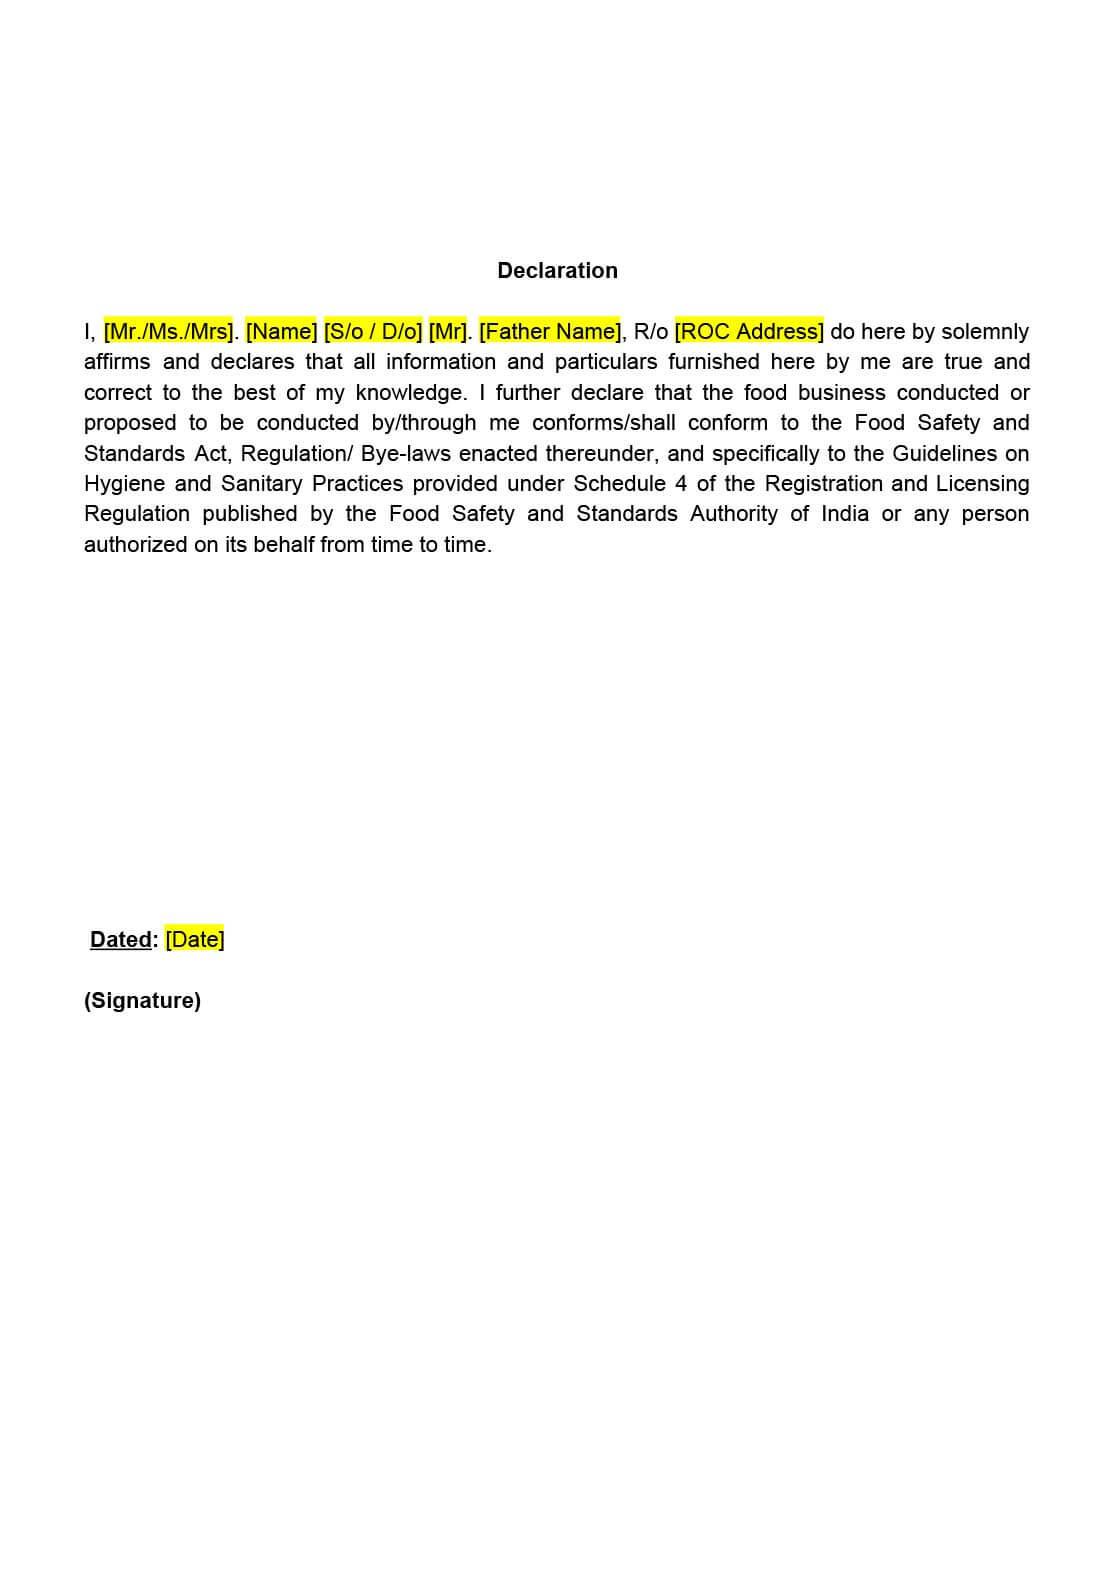 FSSAI-Declaration-Format